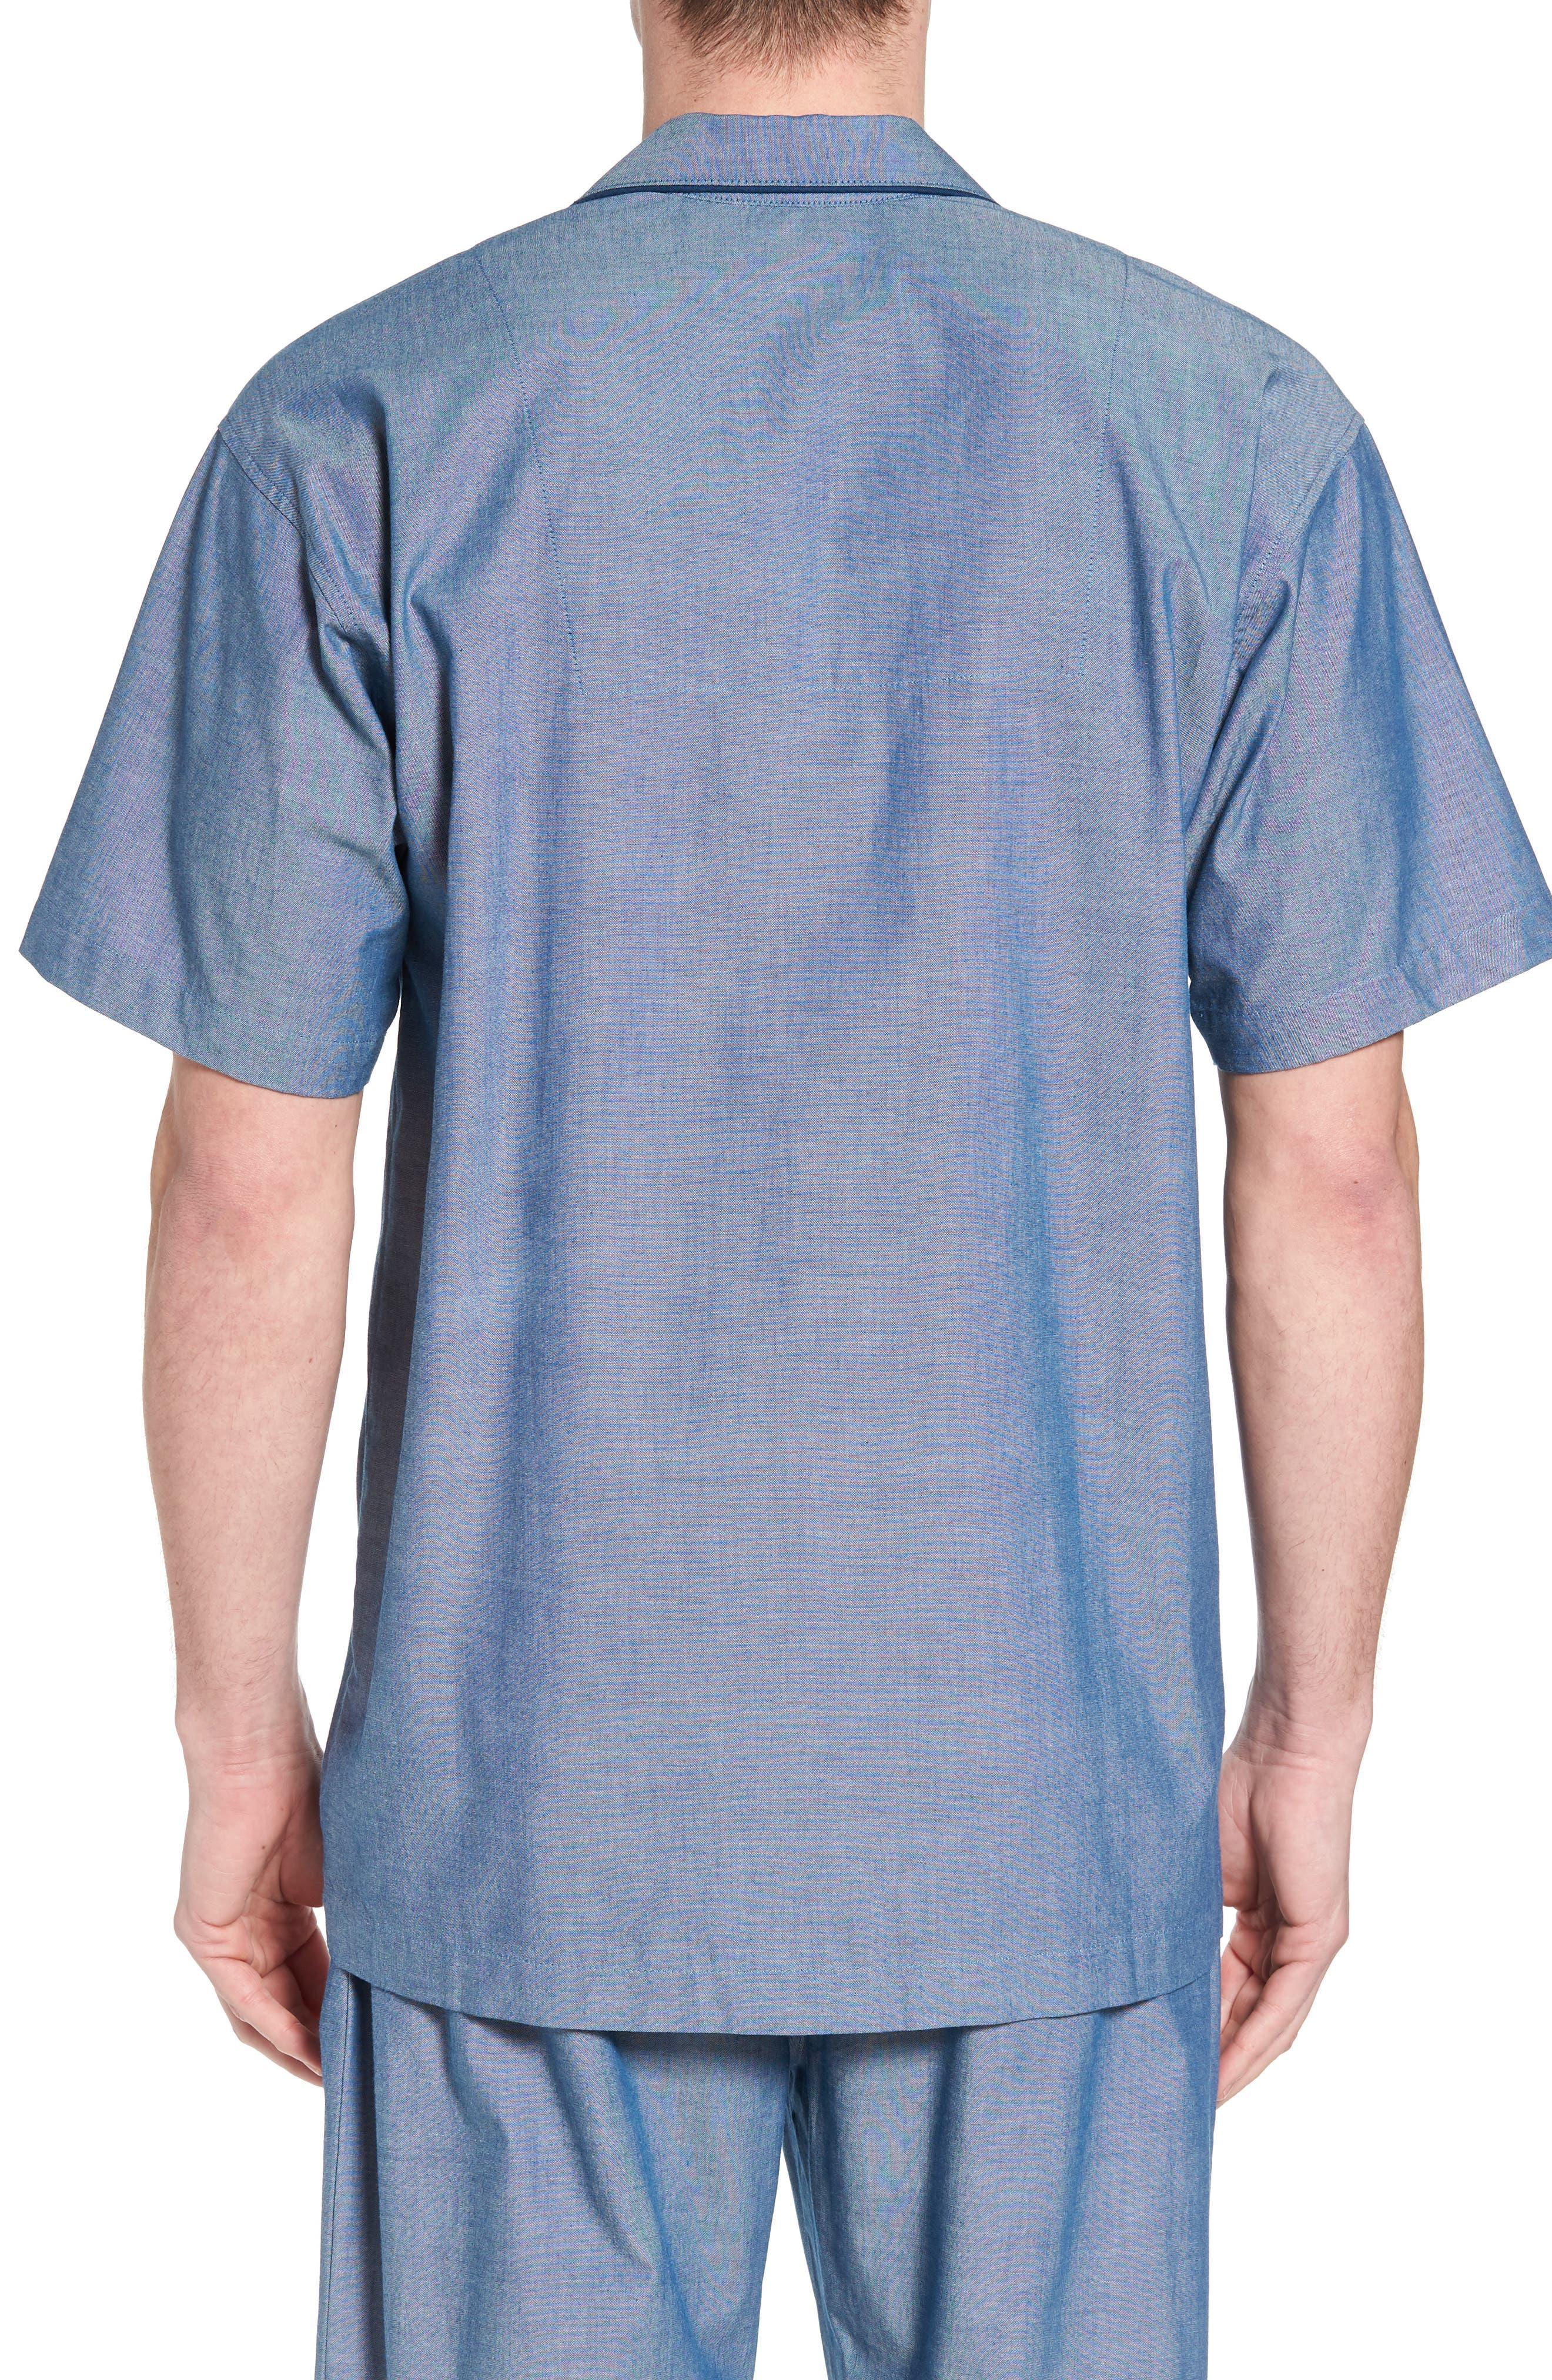 Cotton Pajama Shirt,                             Alternate thumbnail 2, color,                             Medium Indigo/ Dark Indigo